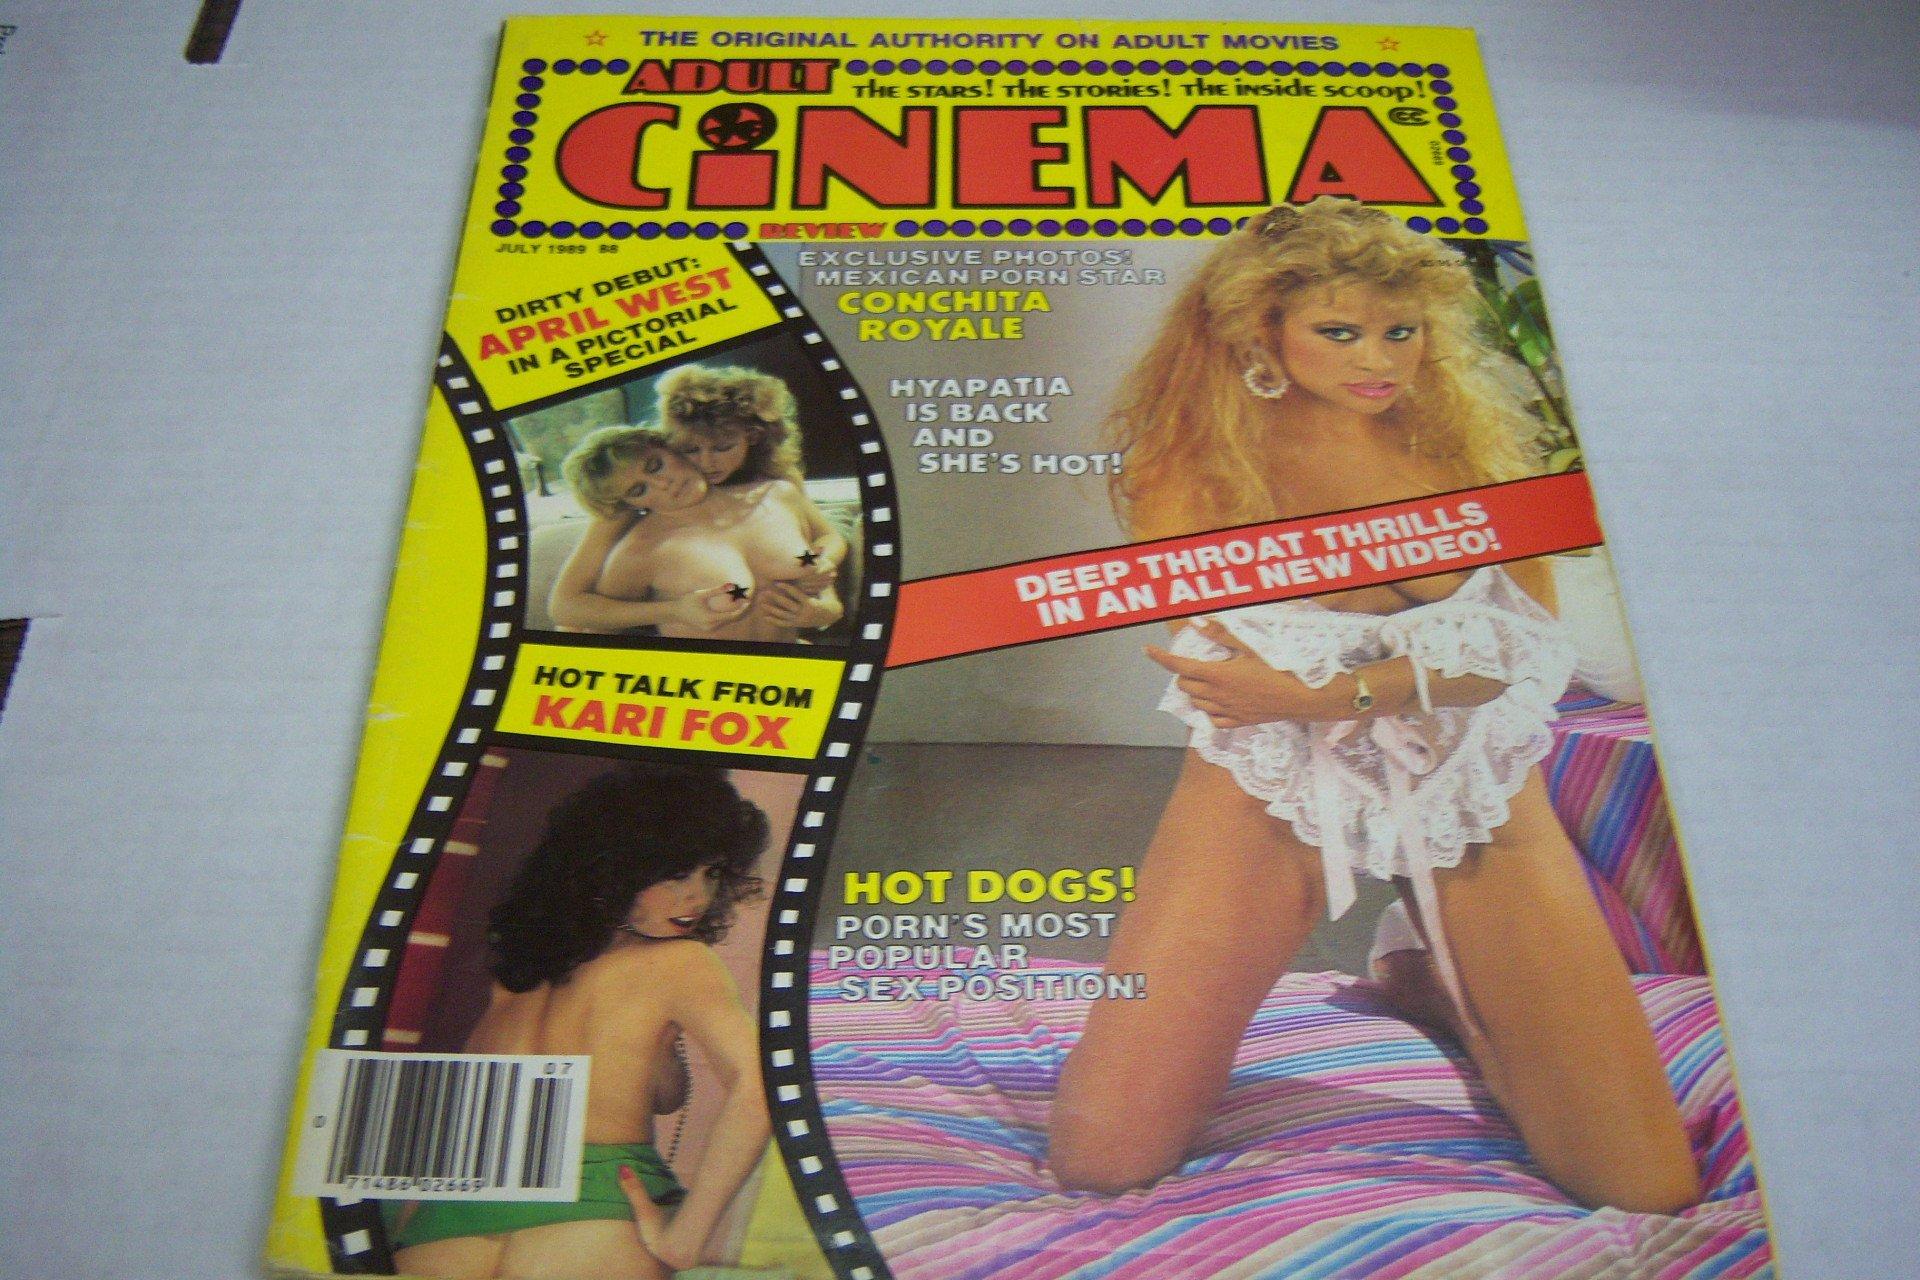 April West Porn Actress Today - Adult Cinema Review Magazine \